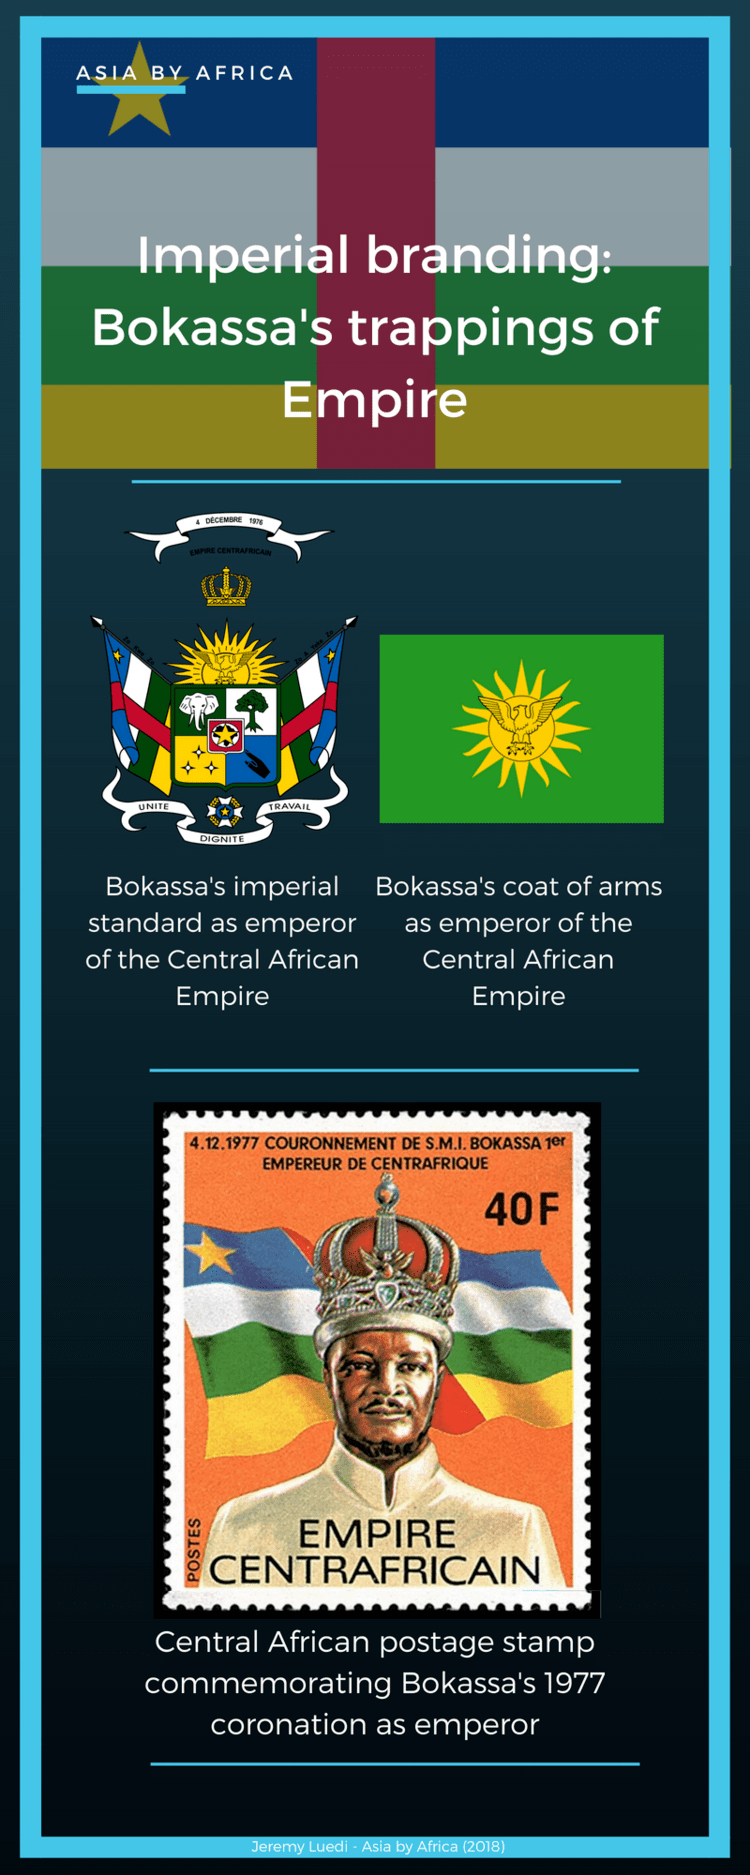 bokassa-central-african-empire-emperor.png